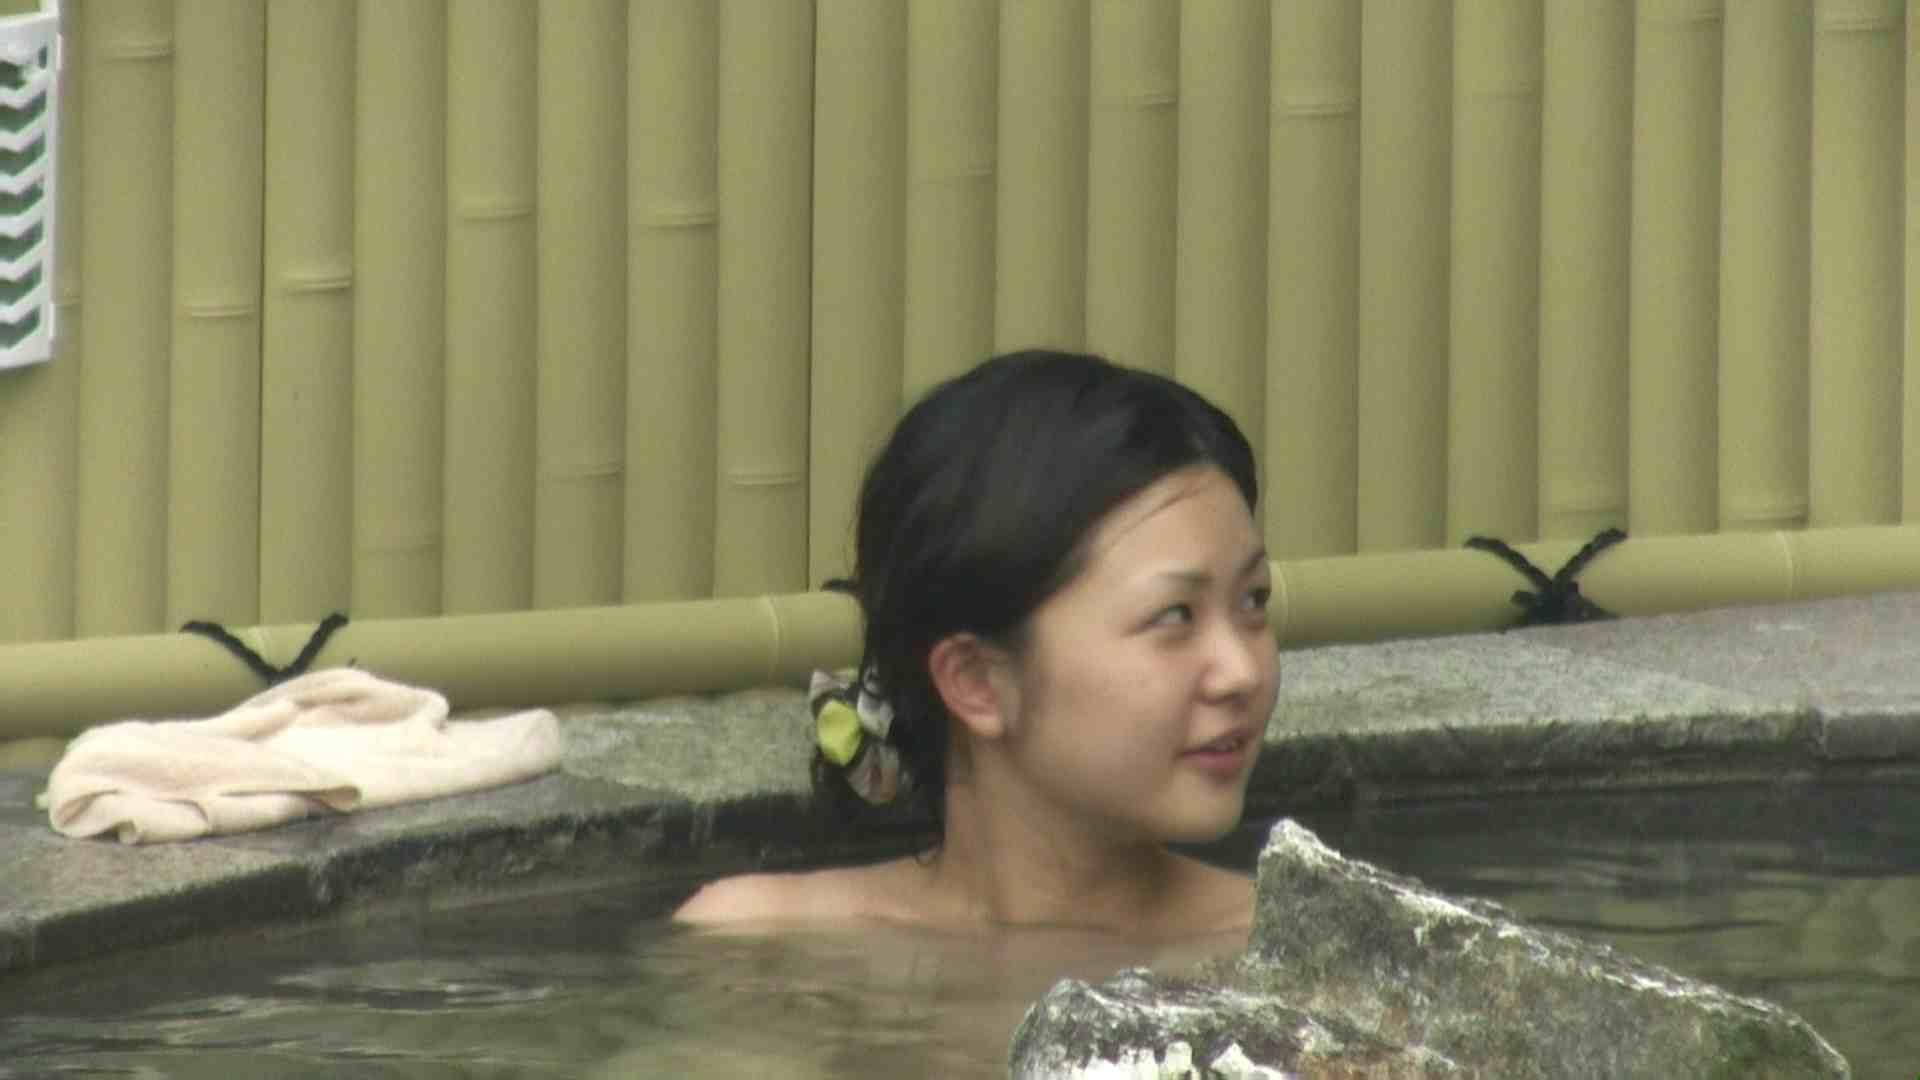 高画質露天女風呂観察 vol.032 女風呂 | OLのエロ生活  101連発 43